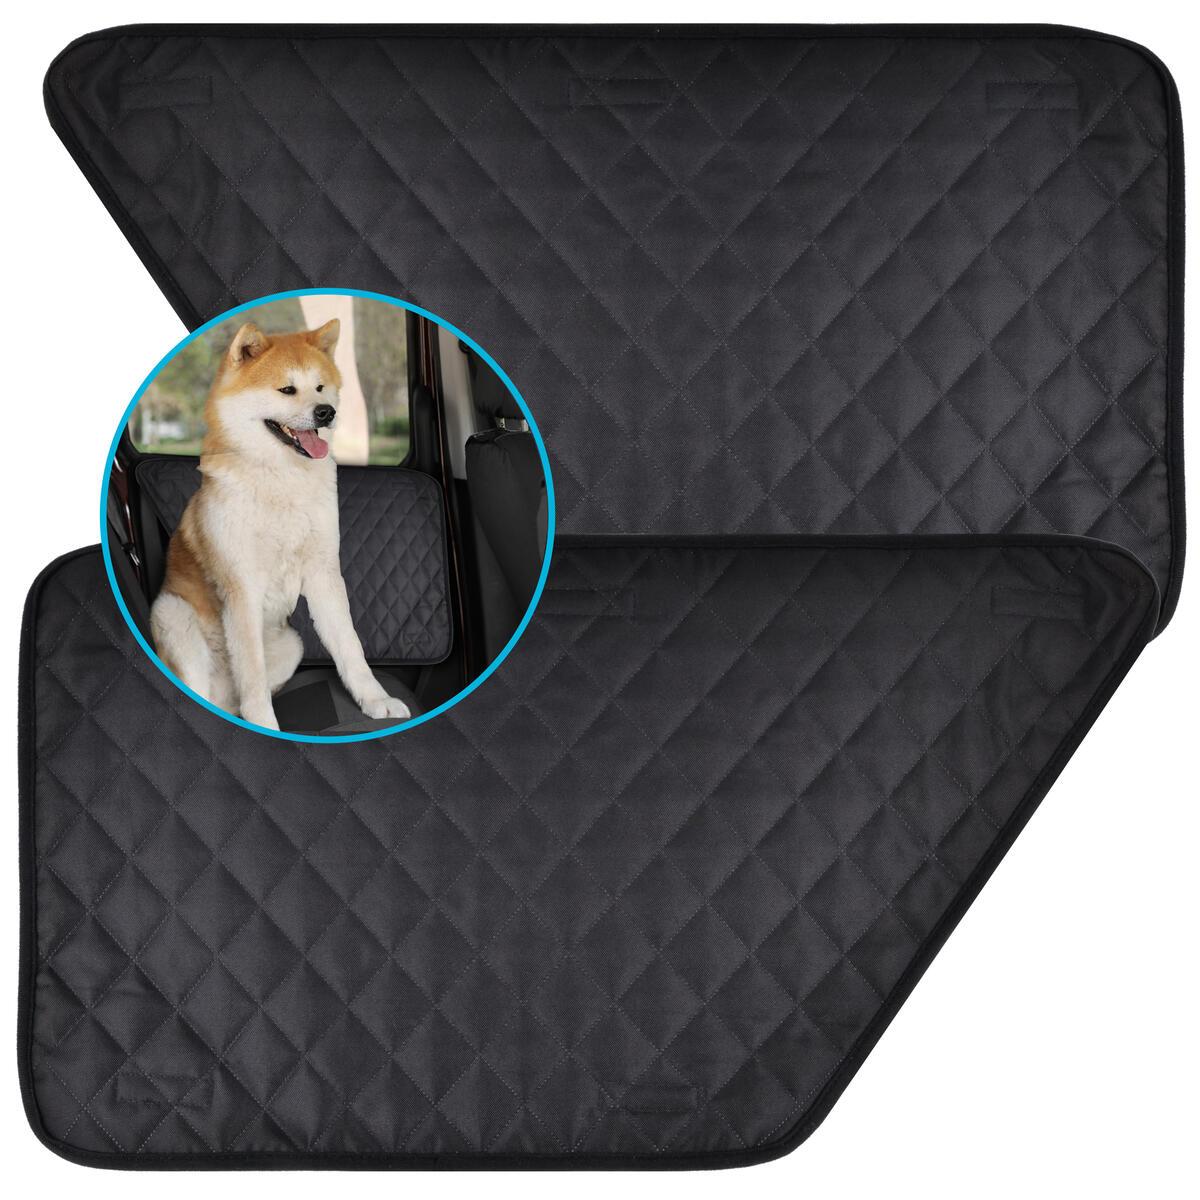 Zone Tech Car Door Pet Barrier - Black Premium Quality Heavy Duty Waterproof, Scratchproof Side Barrier Dog Pet Vehicle Interior Door Cover- Universal Size Fits Cars, Trucks & SUVs (1 Right &1 Left)